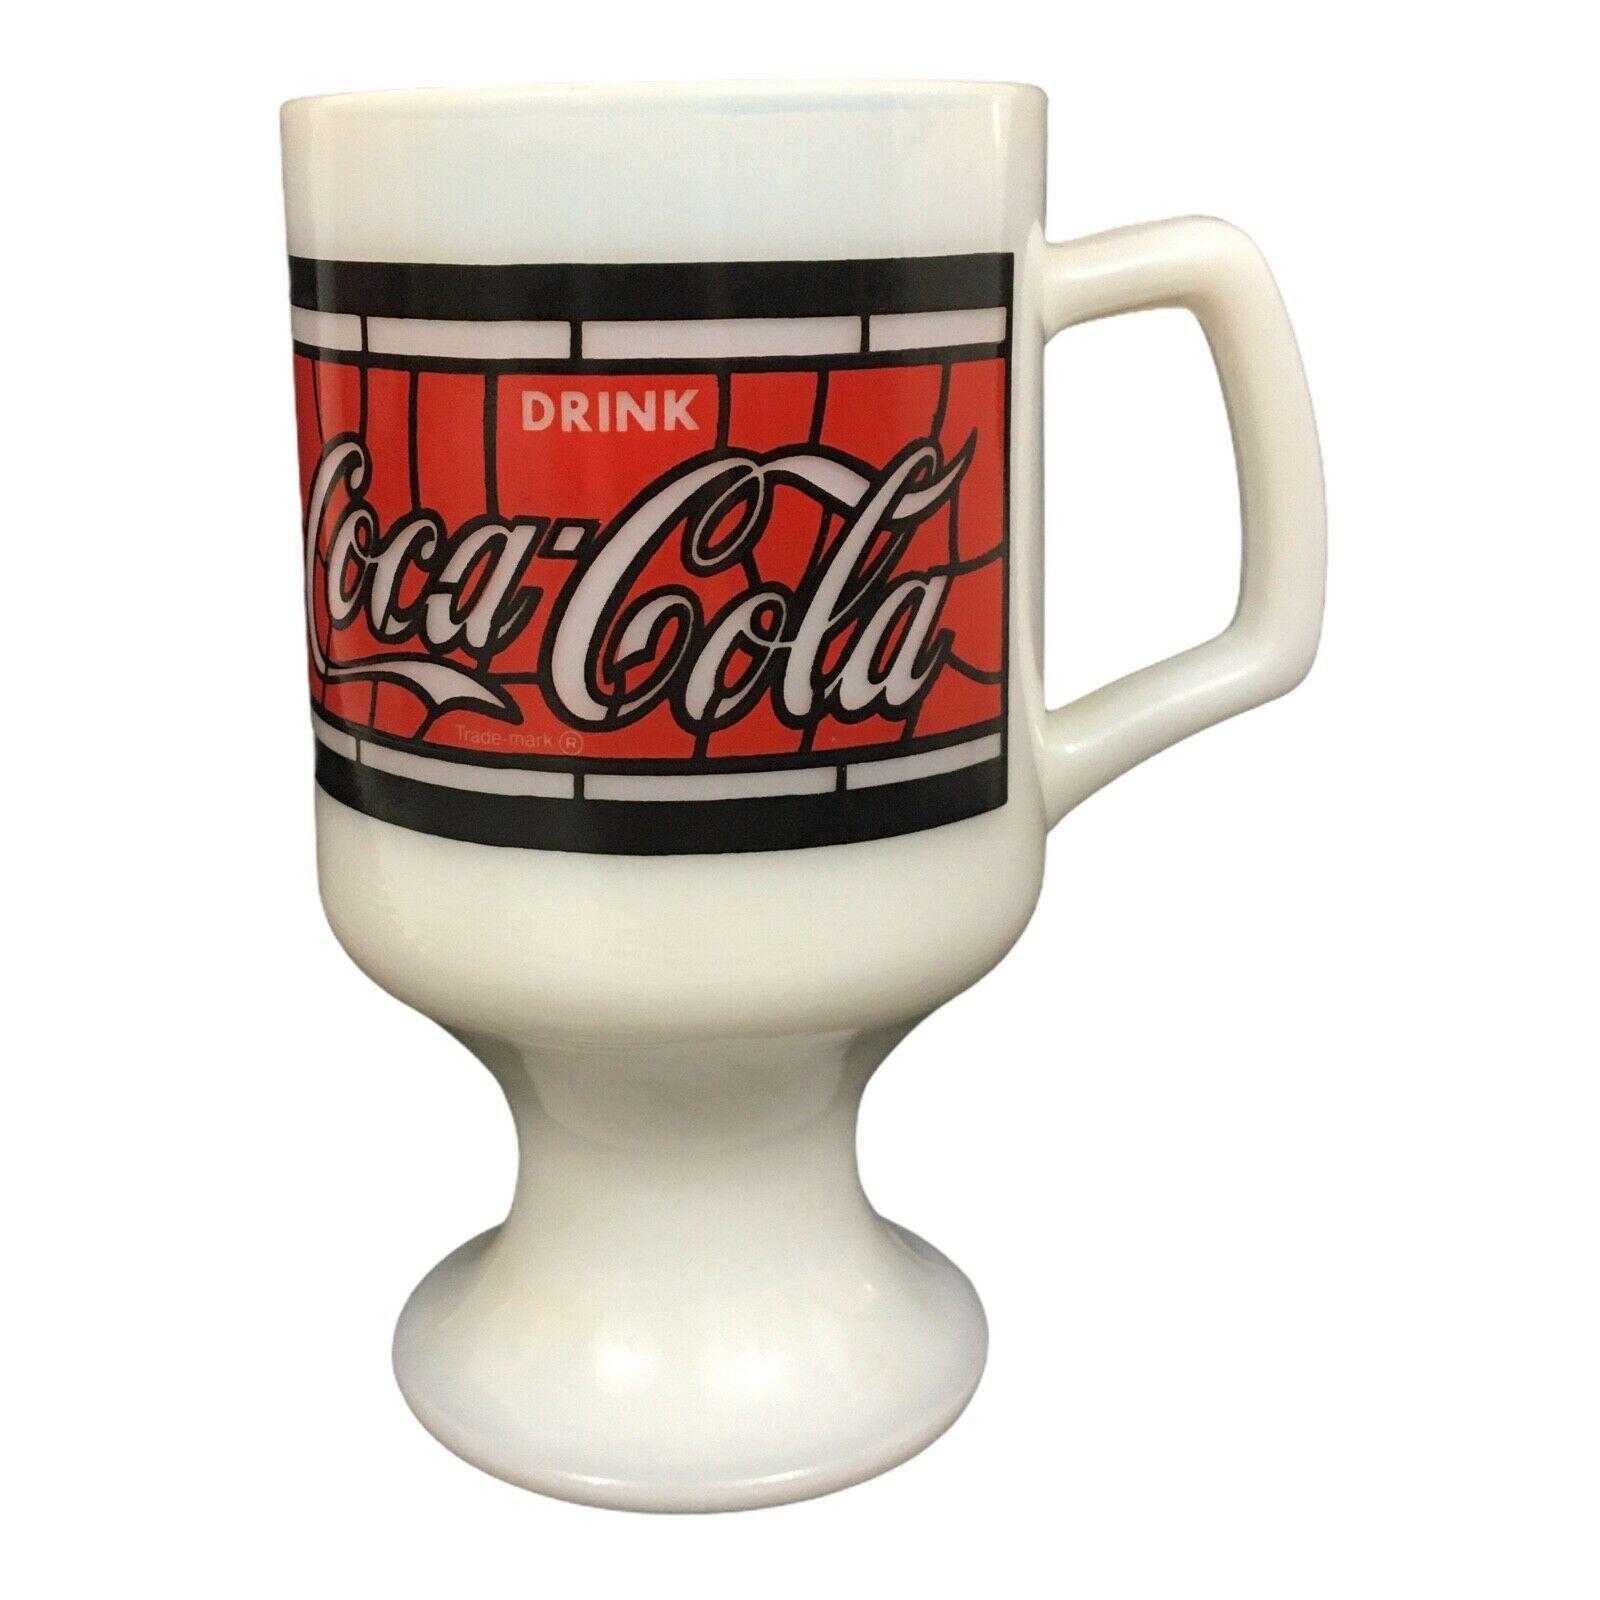 Coca-Cola Milk Glass 1900-1975 75th Anniversary-Pedestal Mug Irish Coffee Cup - $13.85